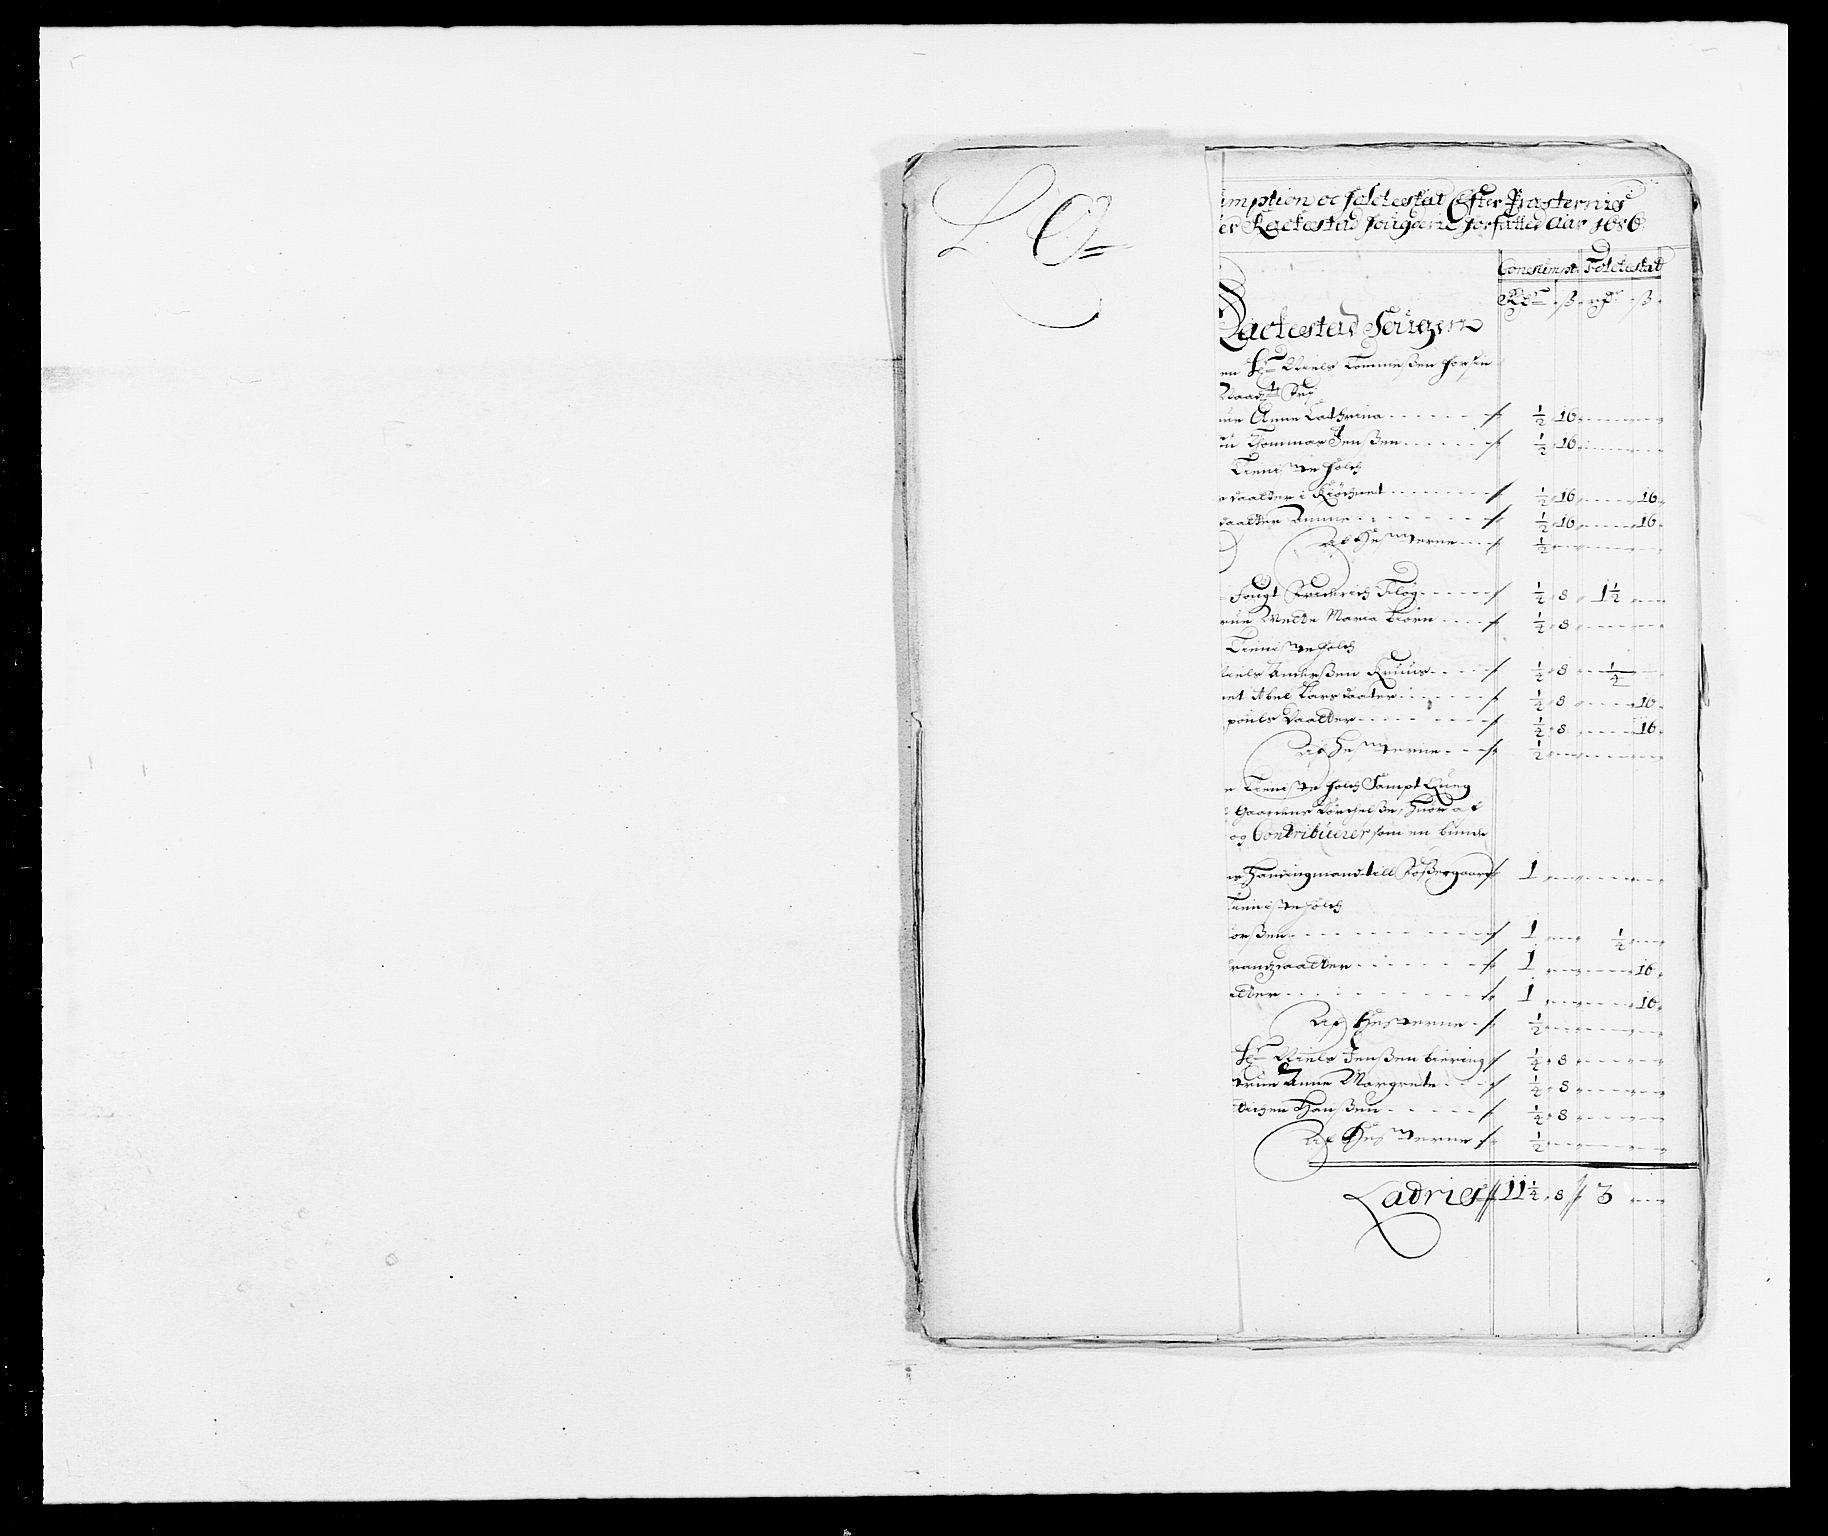 RA, Rentekammeret inntil 1814, Reviderte regnskaper, Fogderegnskap, R05/L0275: Fogderegnskap Rakkestad, 1685-1686, s. 288